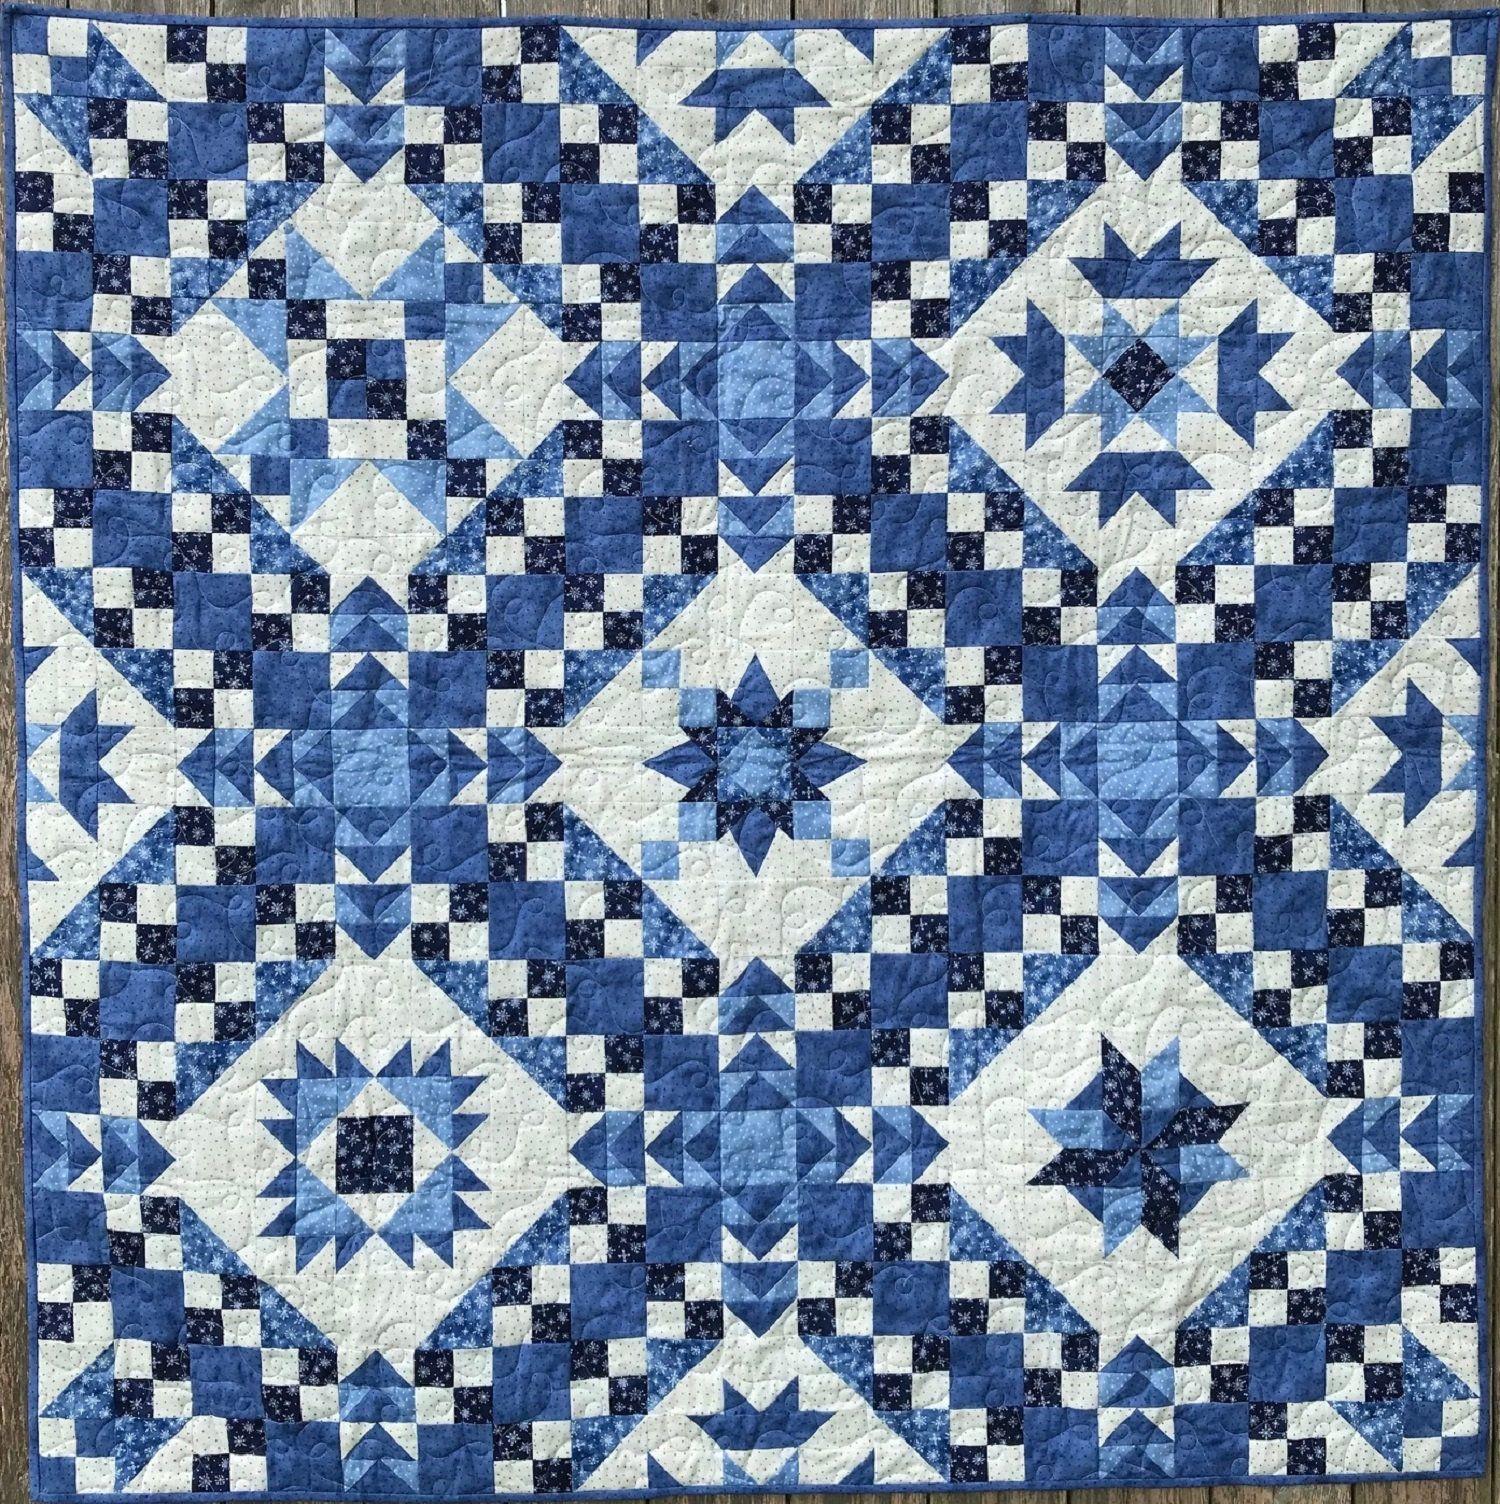 Walking on Sunshine /& Midnight Blue PRINTED Quilt Patterns Applique Quilts Patchwork Quilts Modern Quilt Quilt Patterns